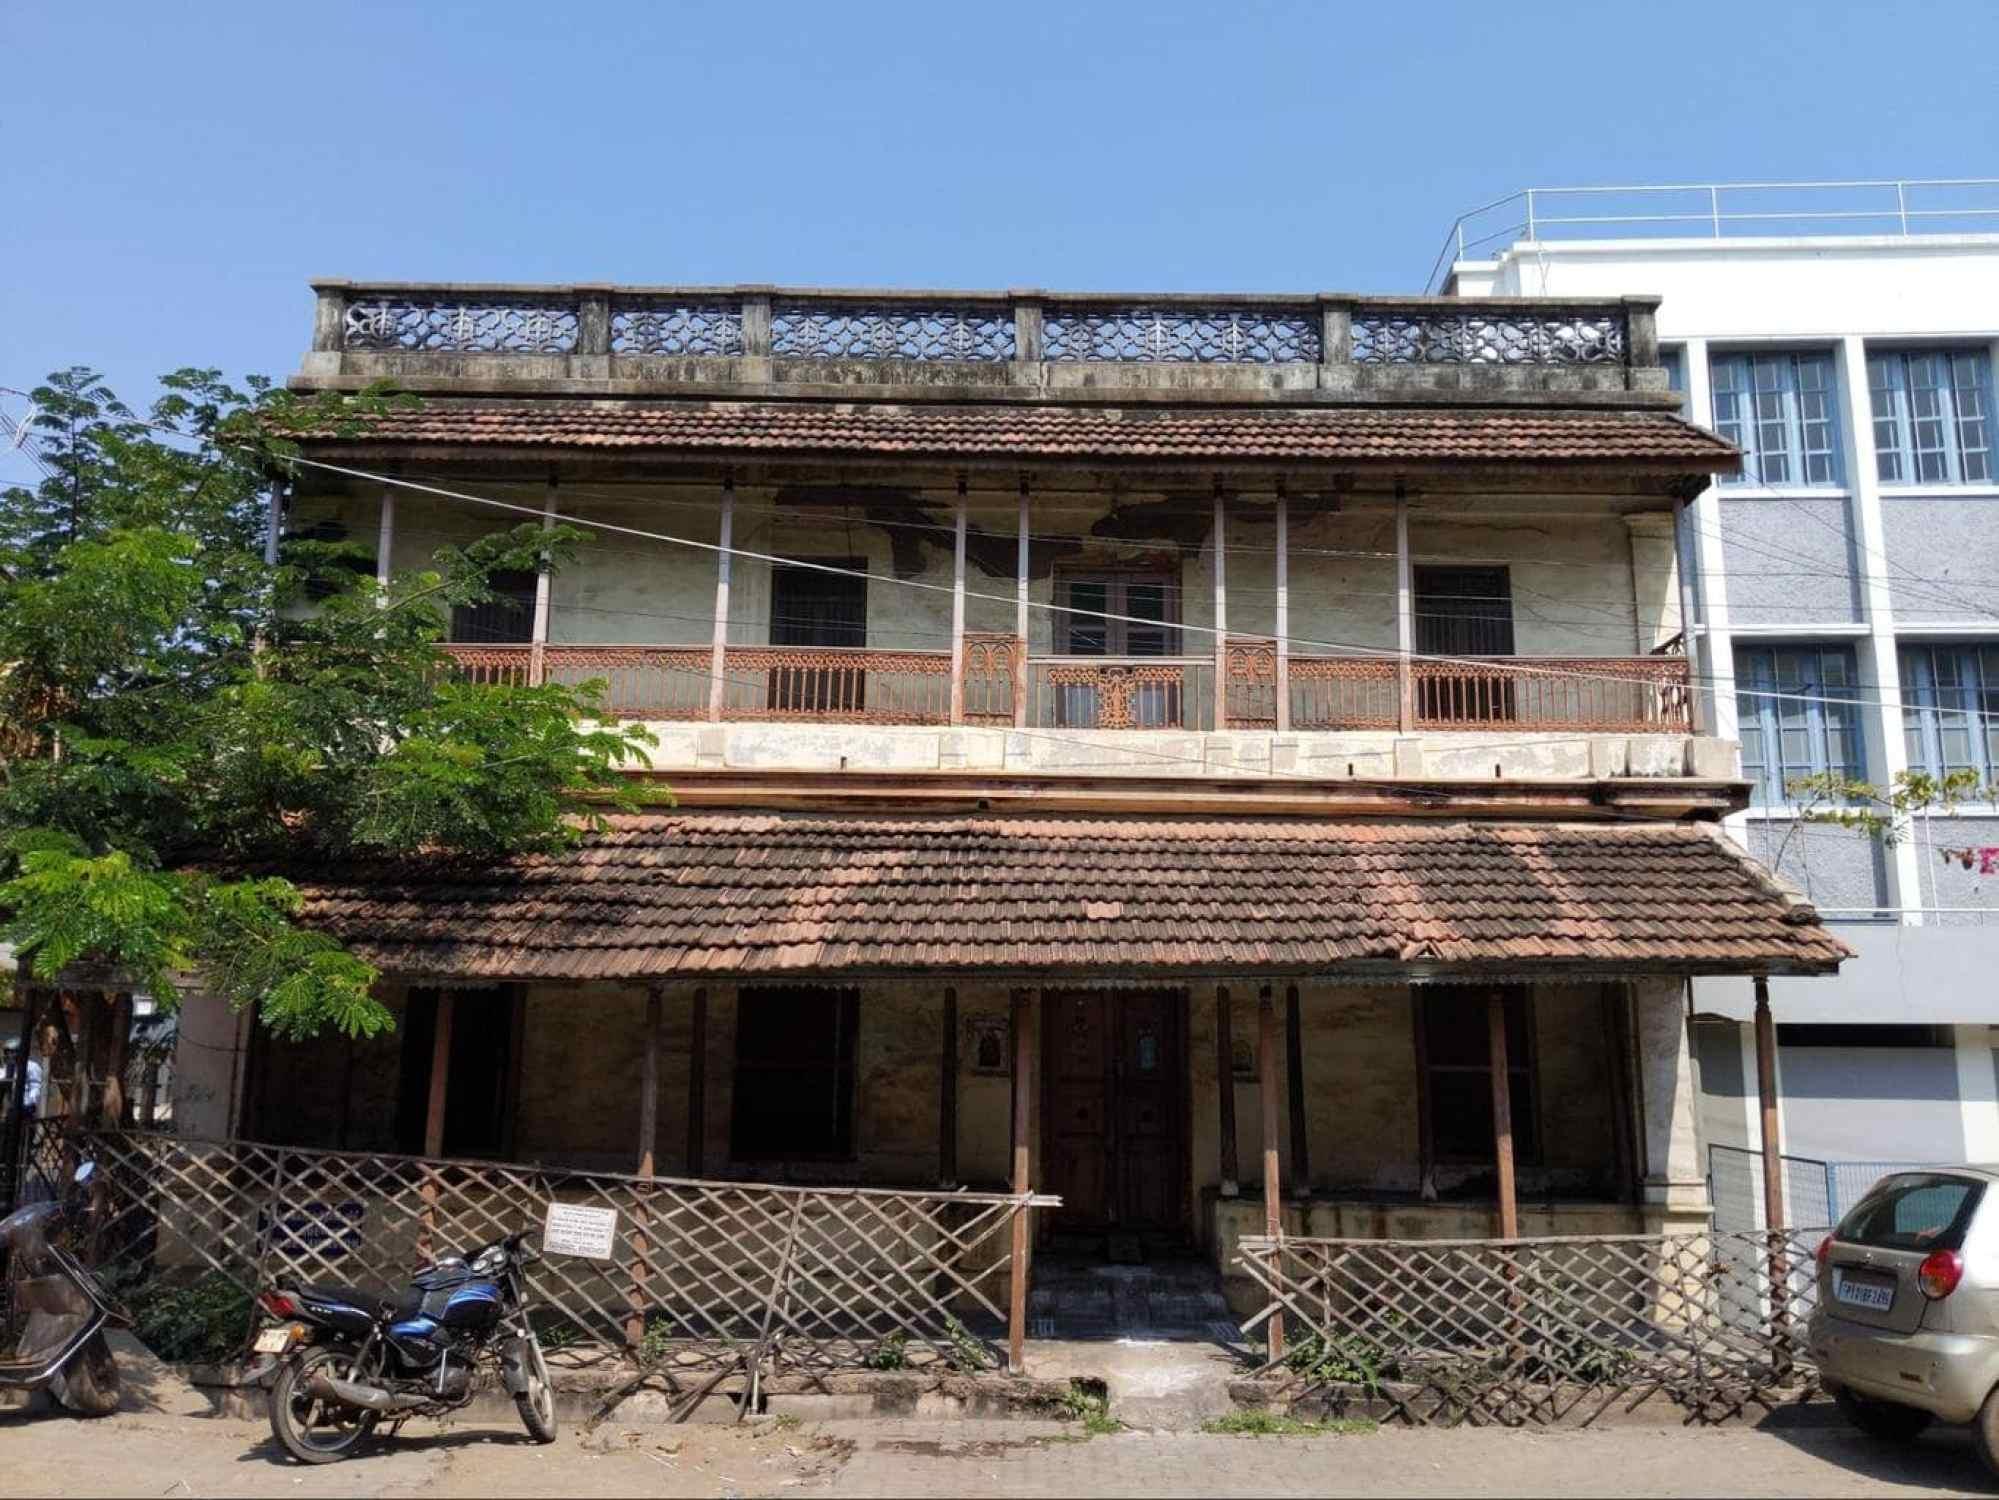 Typical Tamil Quarter architecture